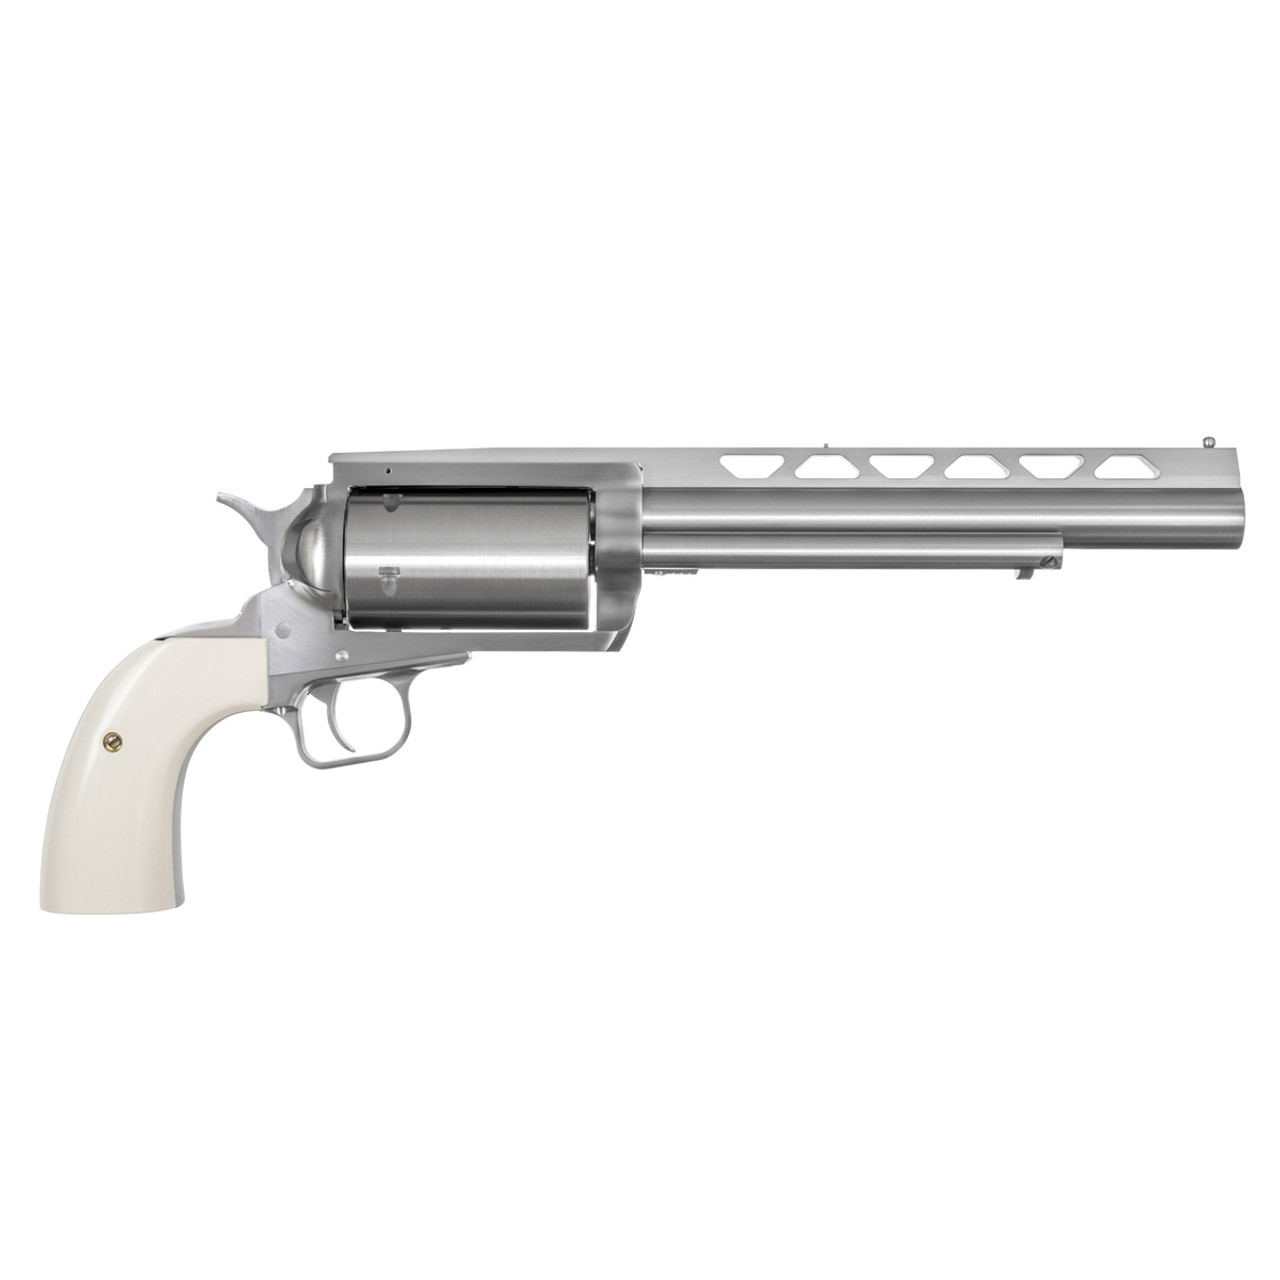 BFR,  45 Long Colt/ 410, 7 5